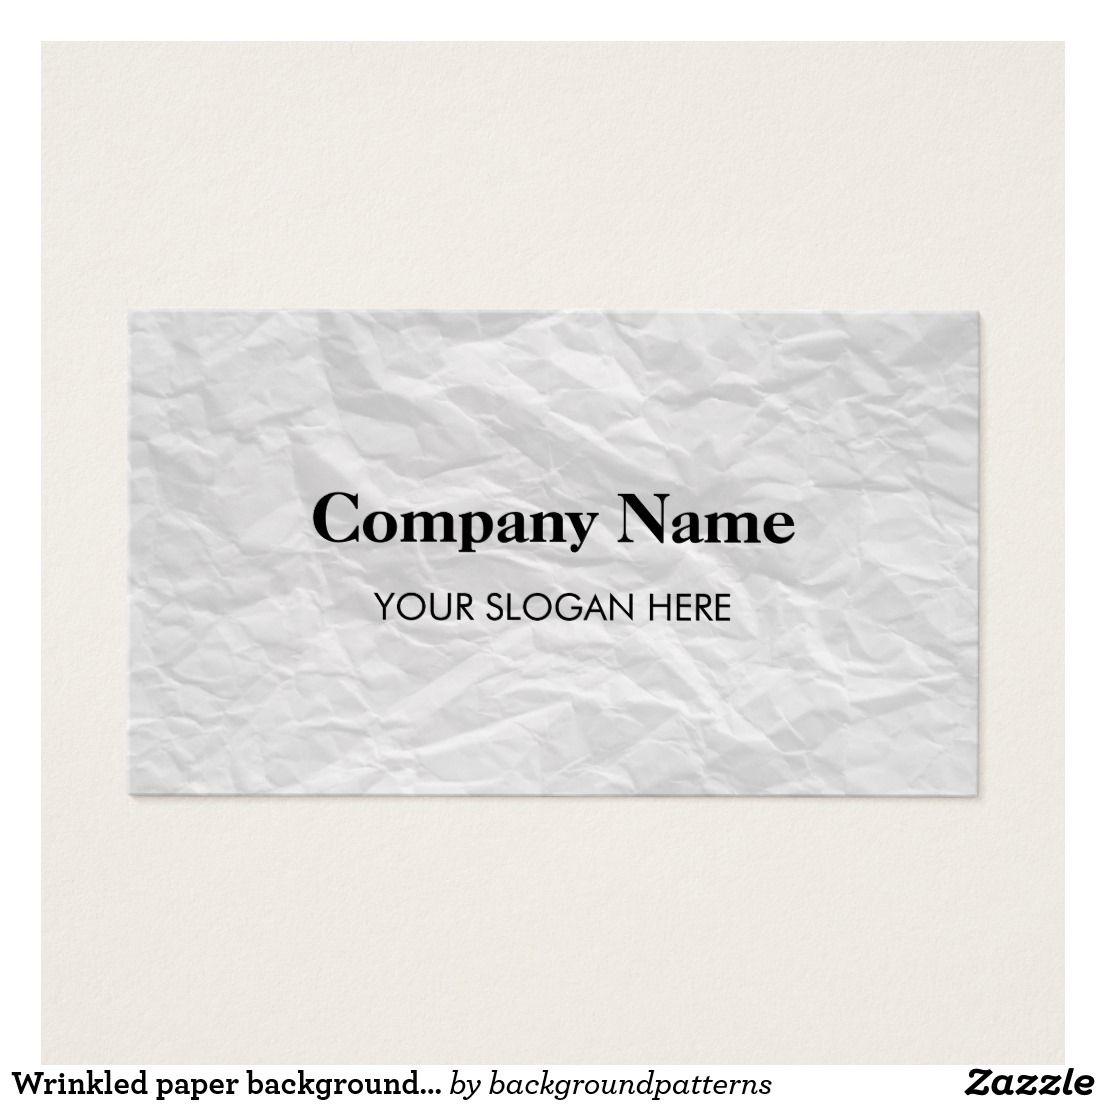 Wrinkled Paper Background Business Card Design Zazzle Com Business Card Design Professional Business Cards Templates Wrinkled Paper Background